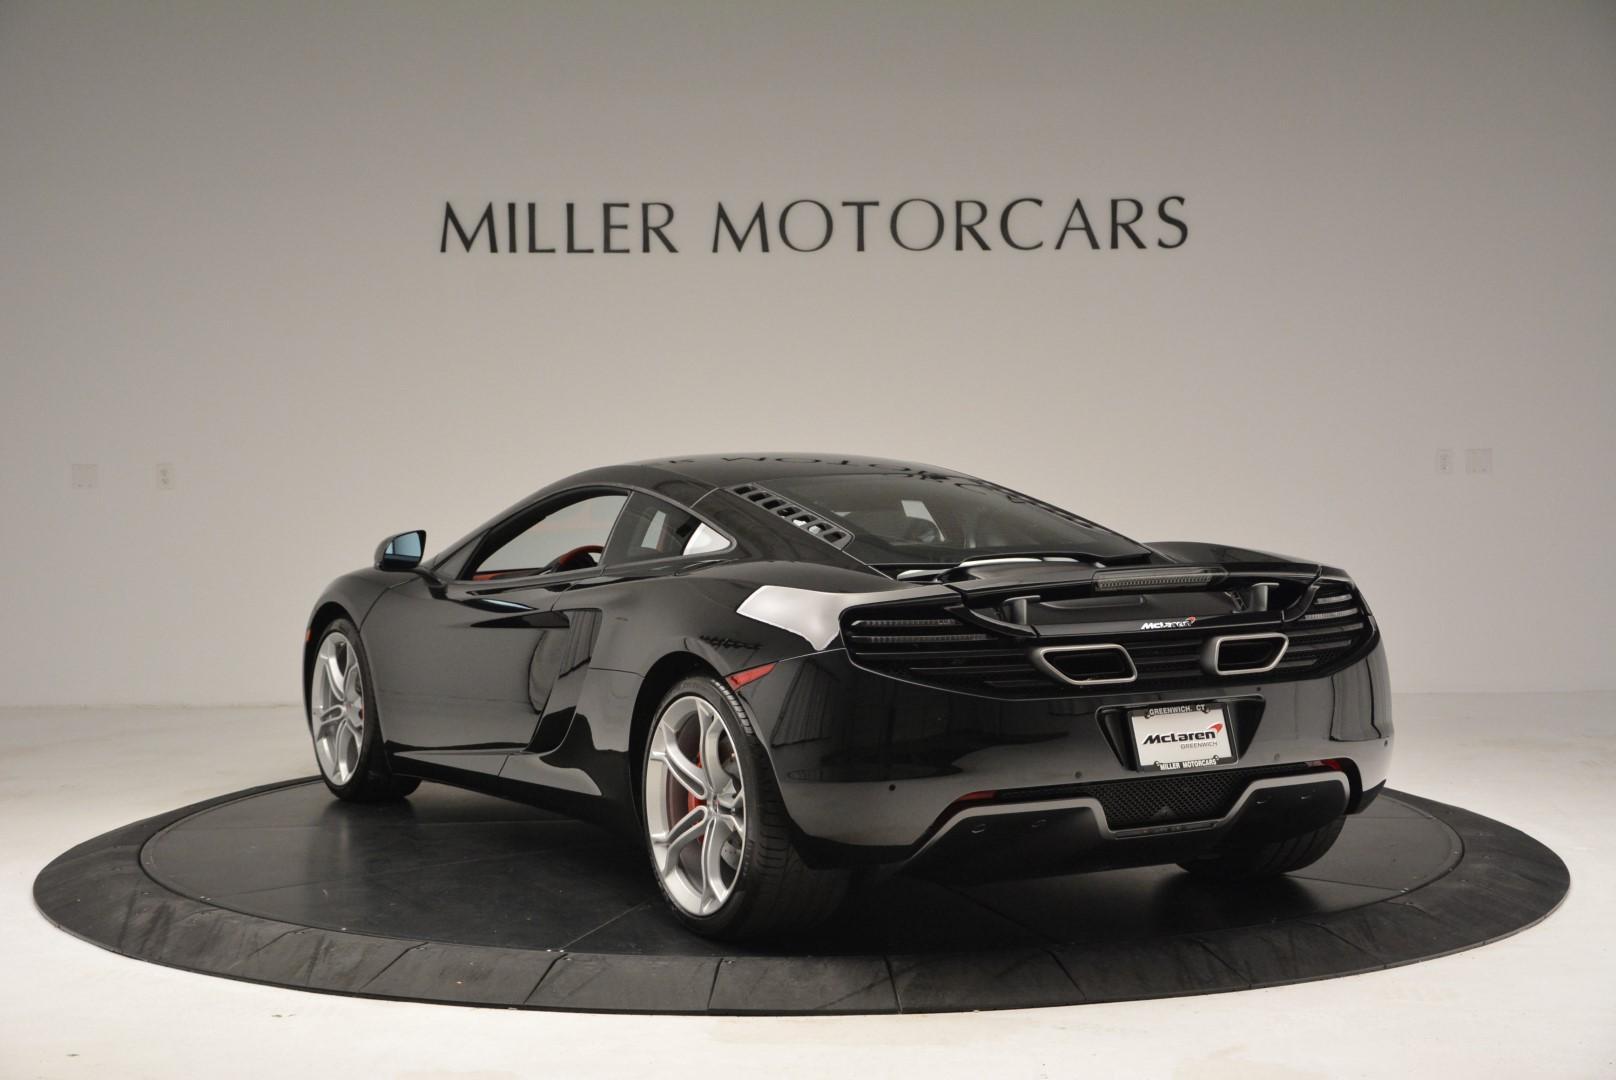 Used 2012 McLaren MP4 12c Coupe